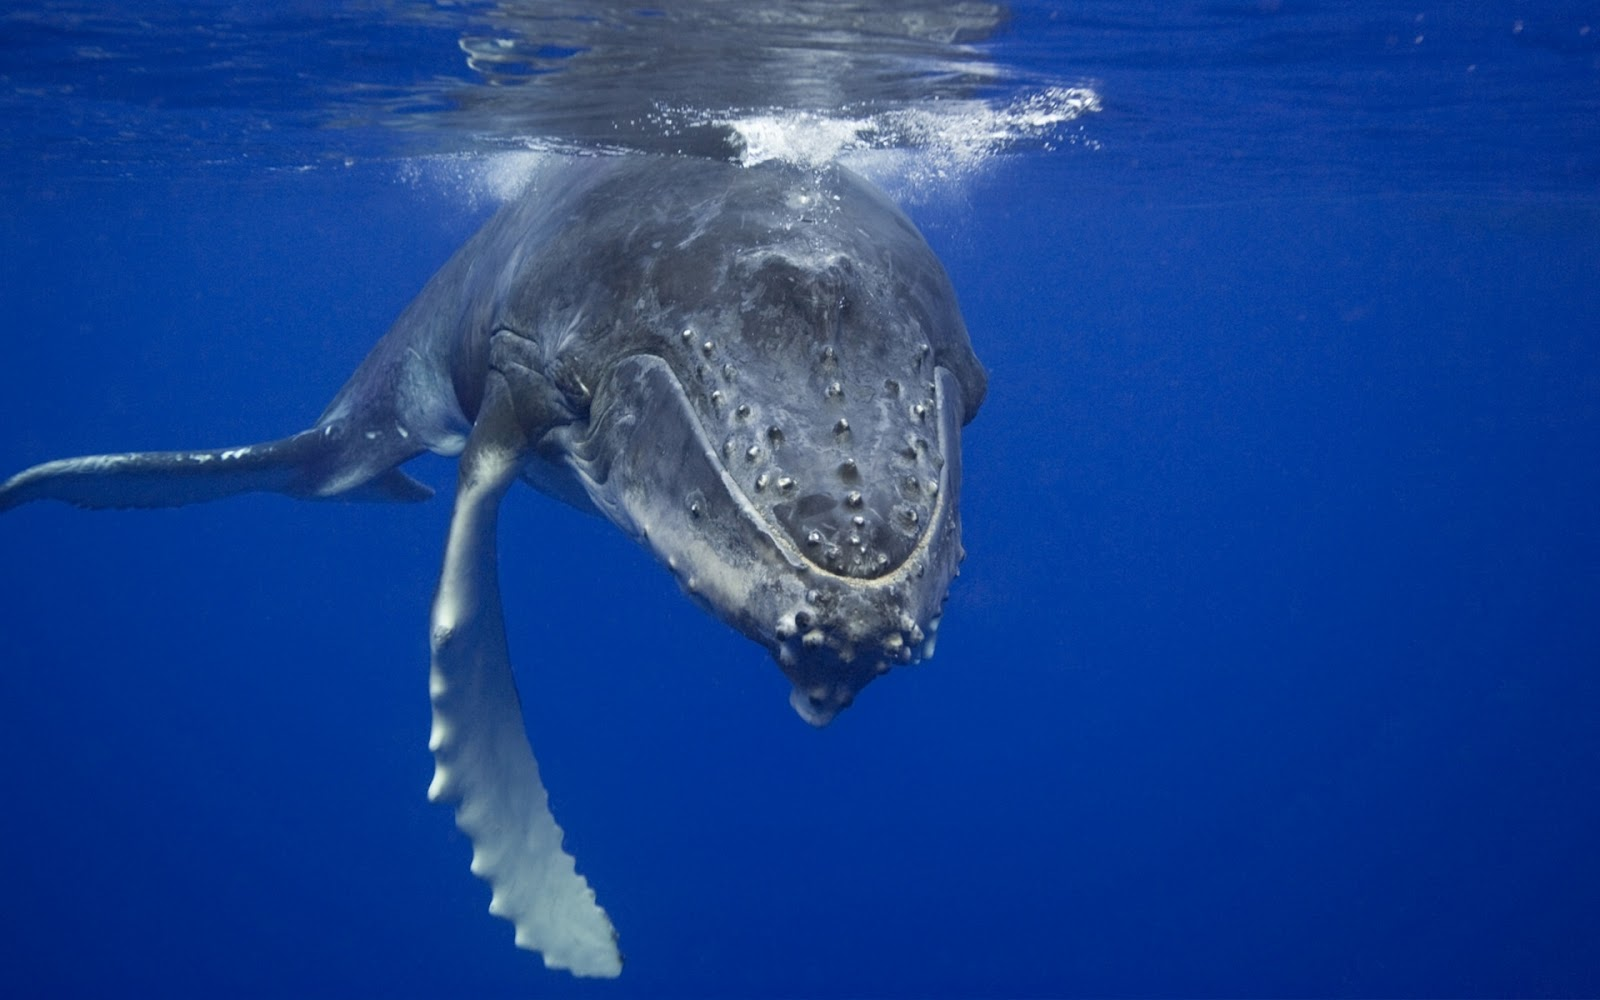 http://2.bp.blogspot.com/-aRky1ItttJM/T1ZFq_myHXI/AAAAAAAAAj4/w_JGABHwsdM/s1600/Whale+Wallpaper%252C+Widescreen%252C+whale%252C+ocean%252C+blue.jpg